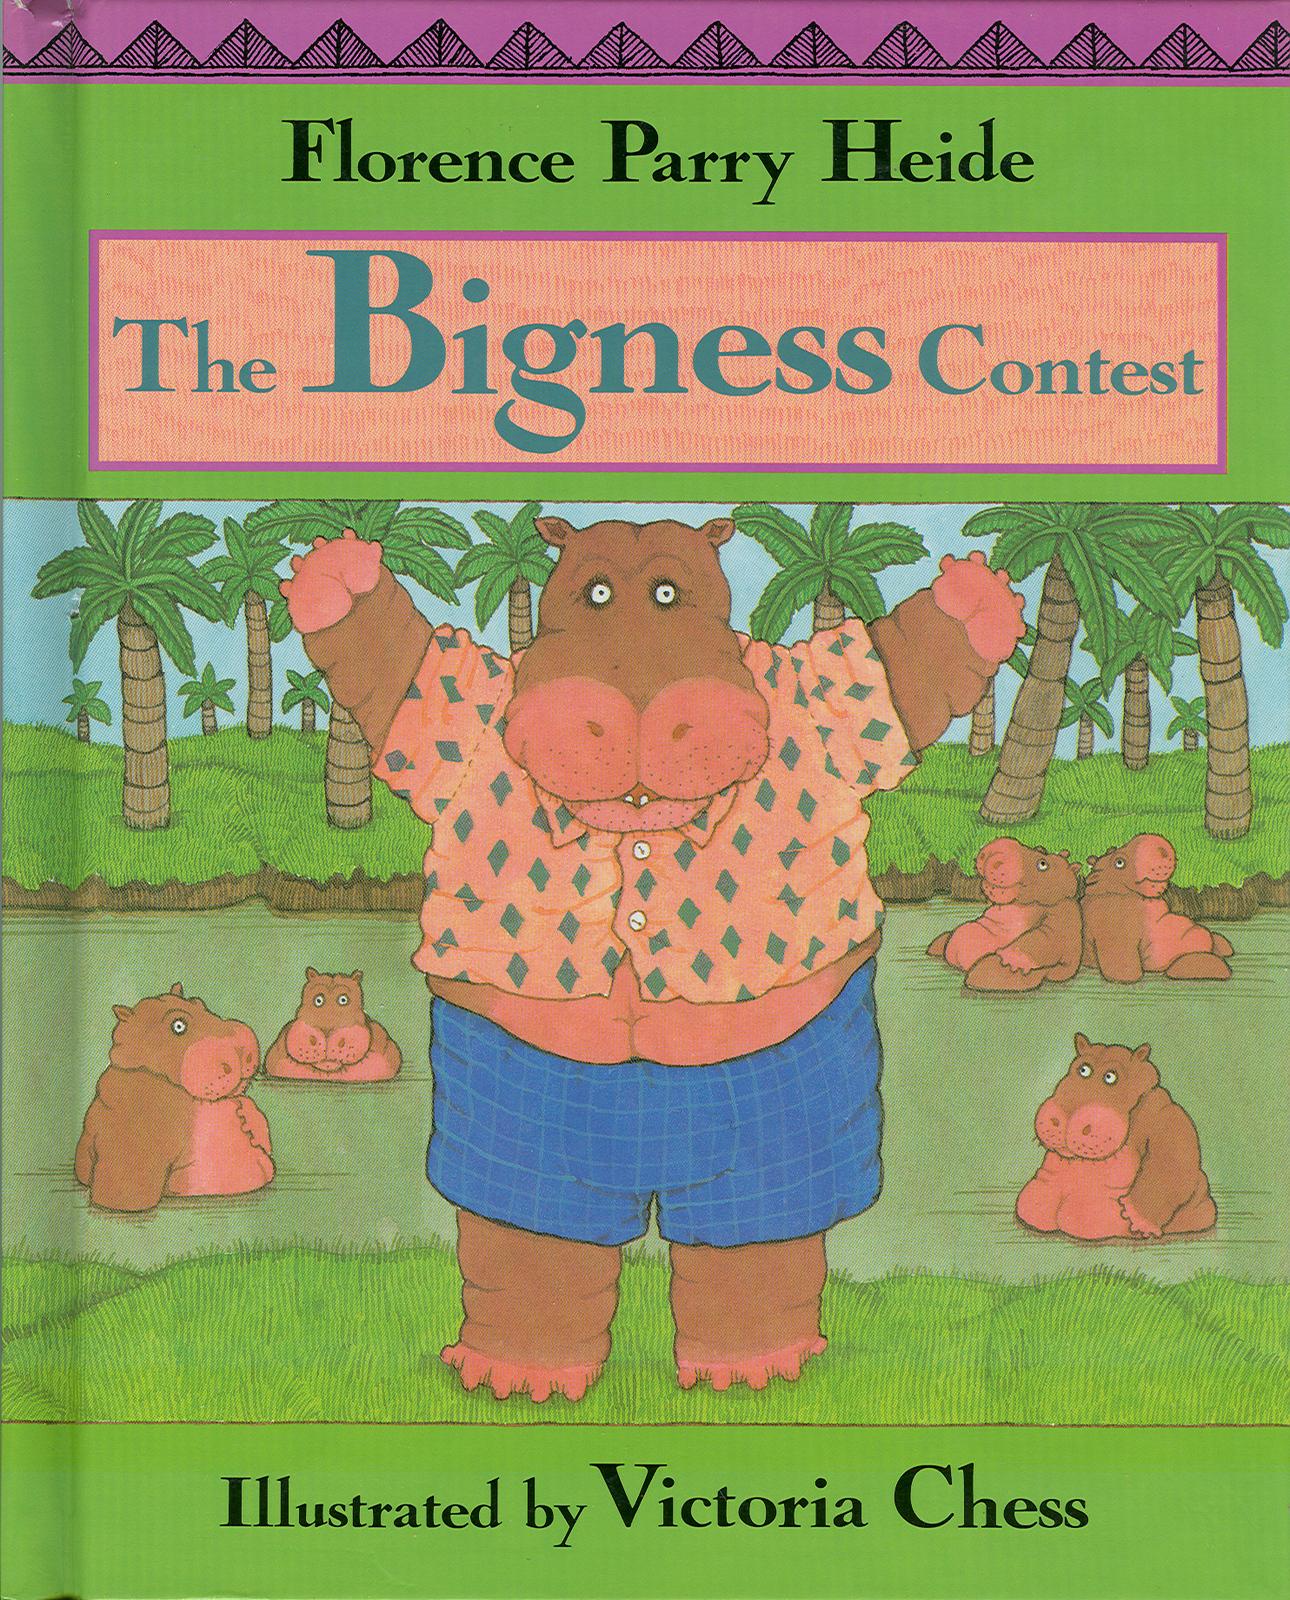 The Bigness Contest-Florence Heide;Individuality;Hippopotamus;ACHIEVE SELF-ESTEE